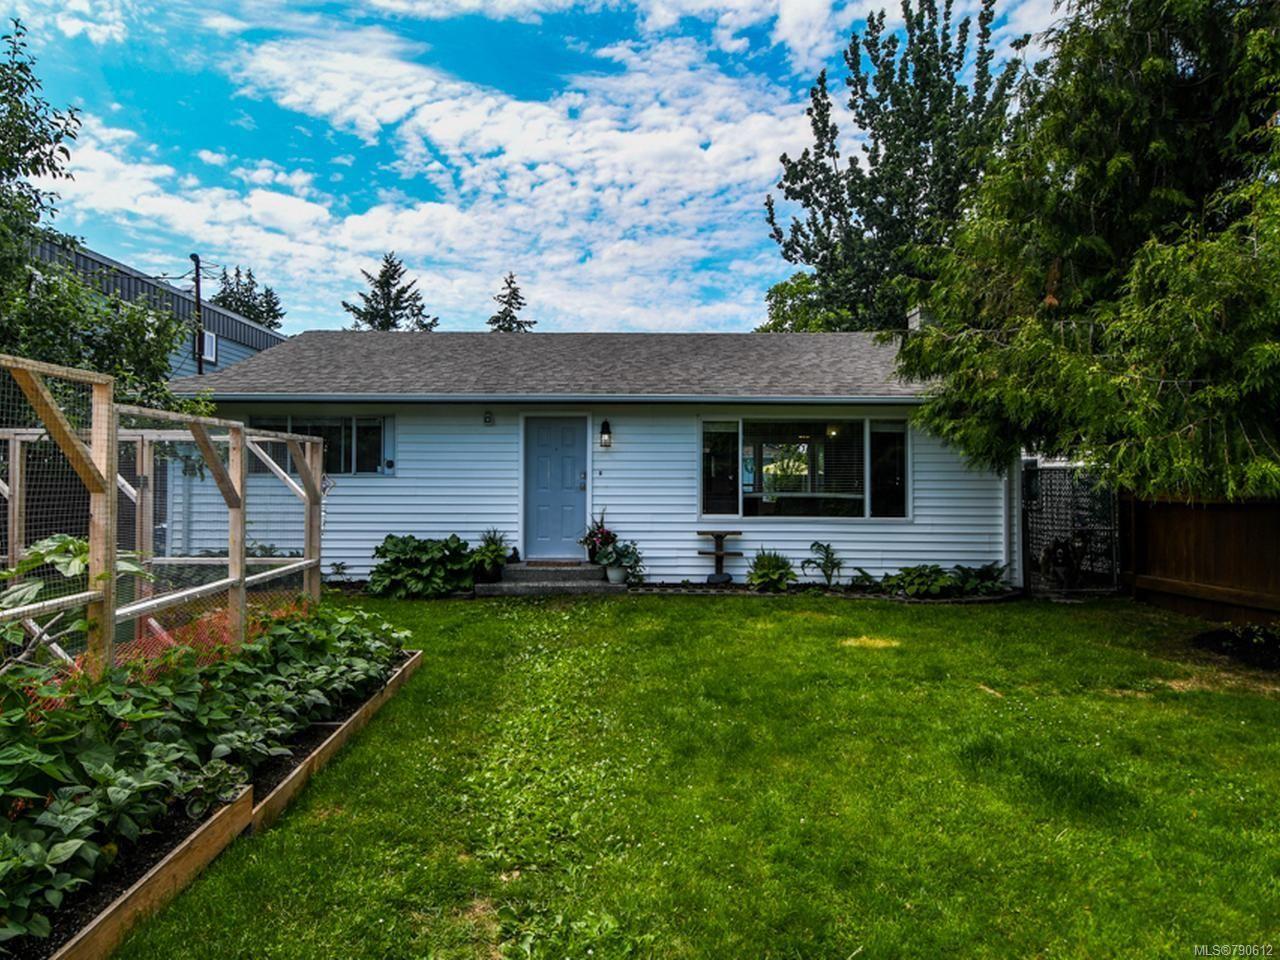 Main Photo: 542 CEDAR STREET in CAMPBELL RIVER: CR Campbell River Central House for sale (Campbell River)  : MLS®# 790612